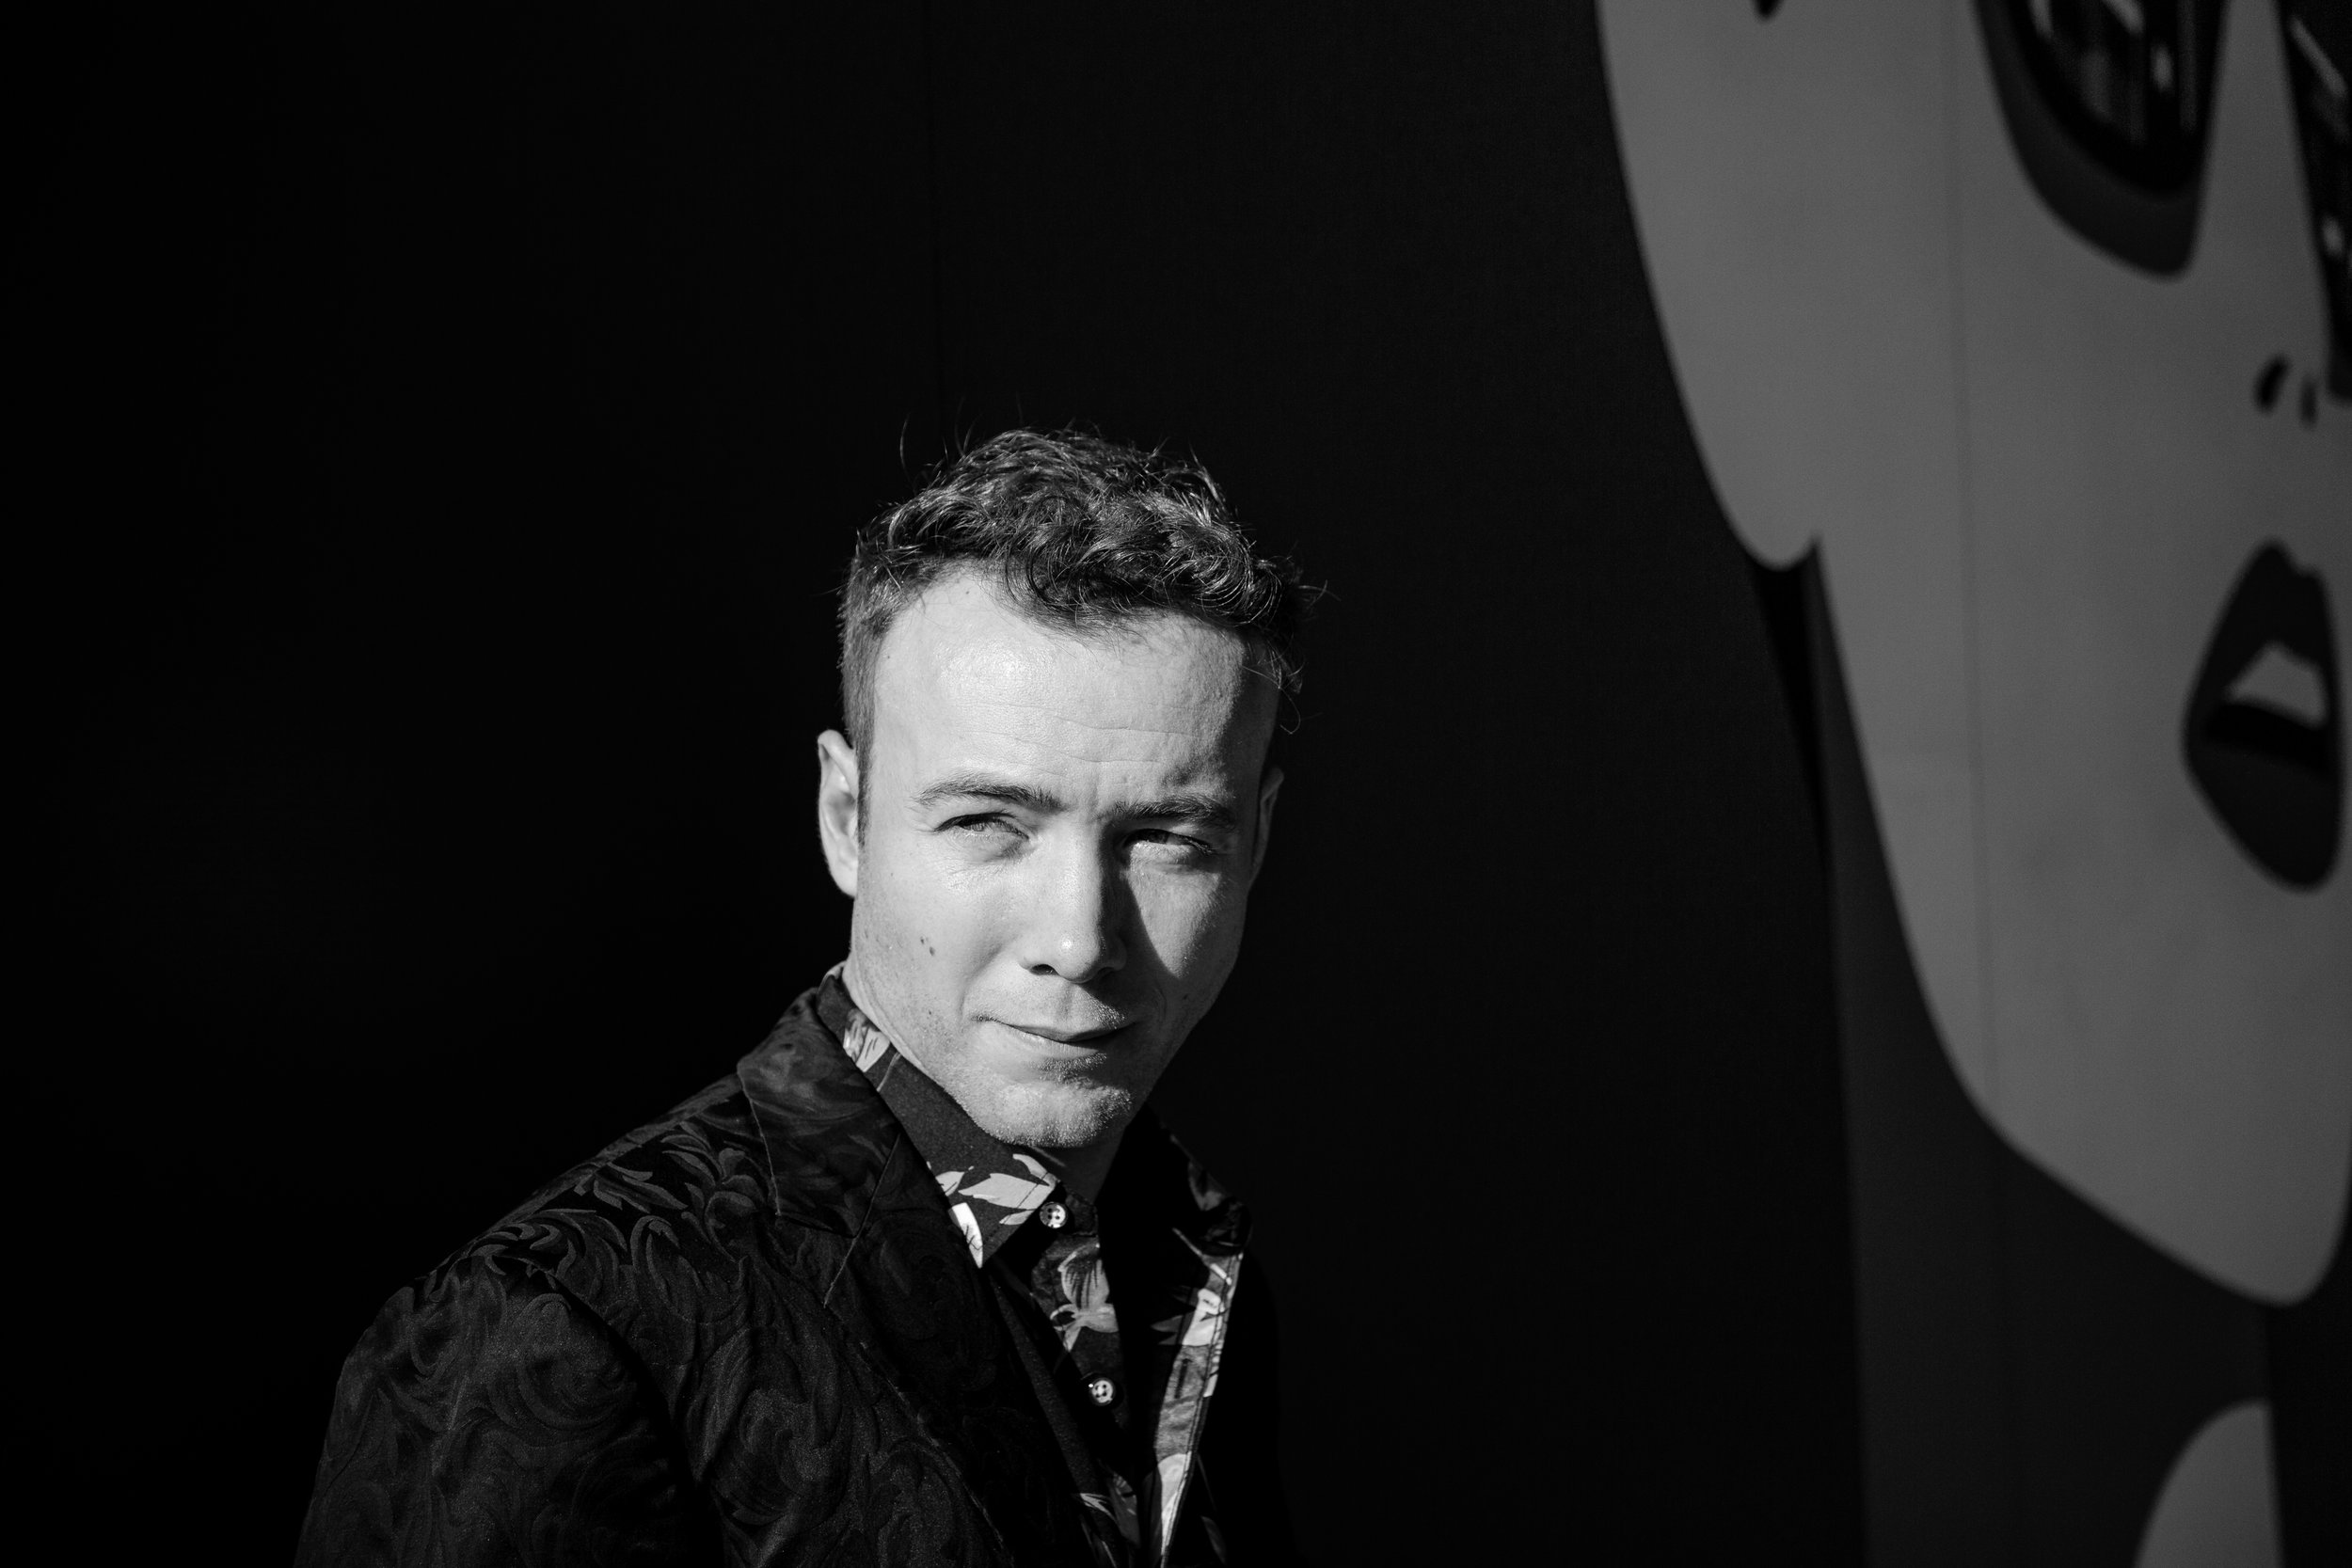 Photographer - Stev Elam